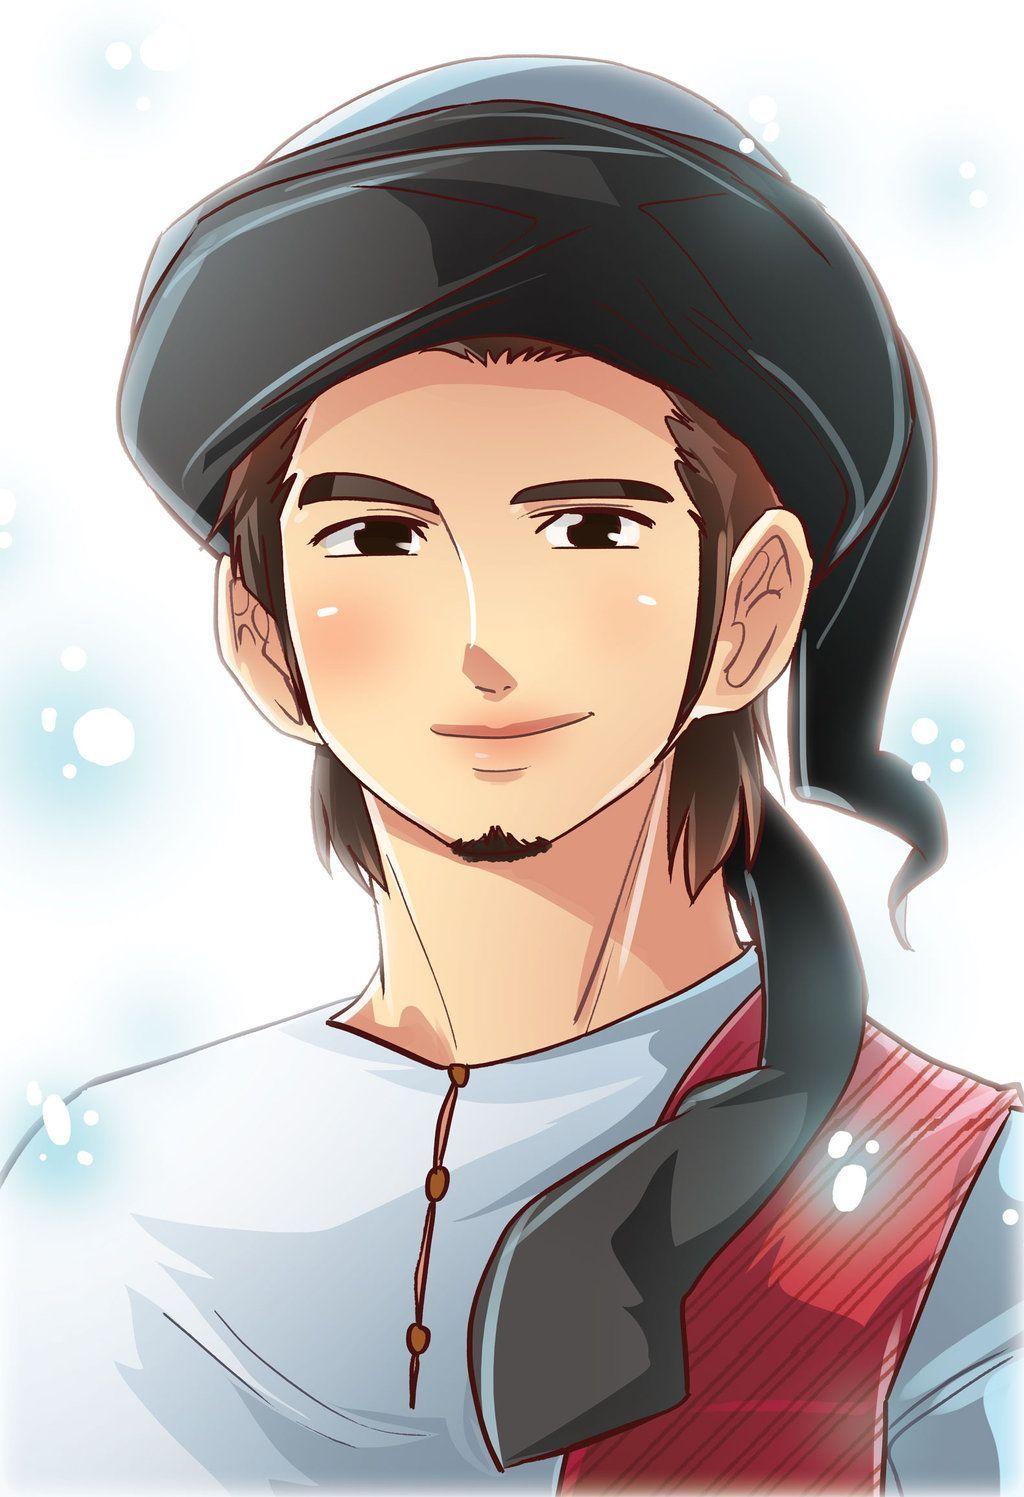 Anime Boy Muslim Cute Wallpapers - Wallpaper Cave